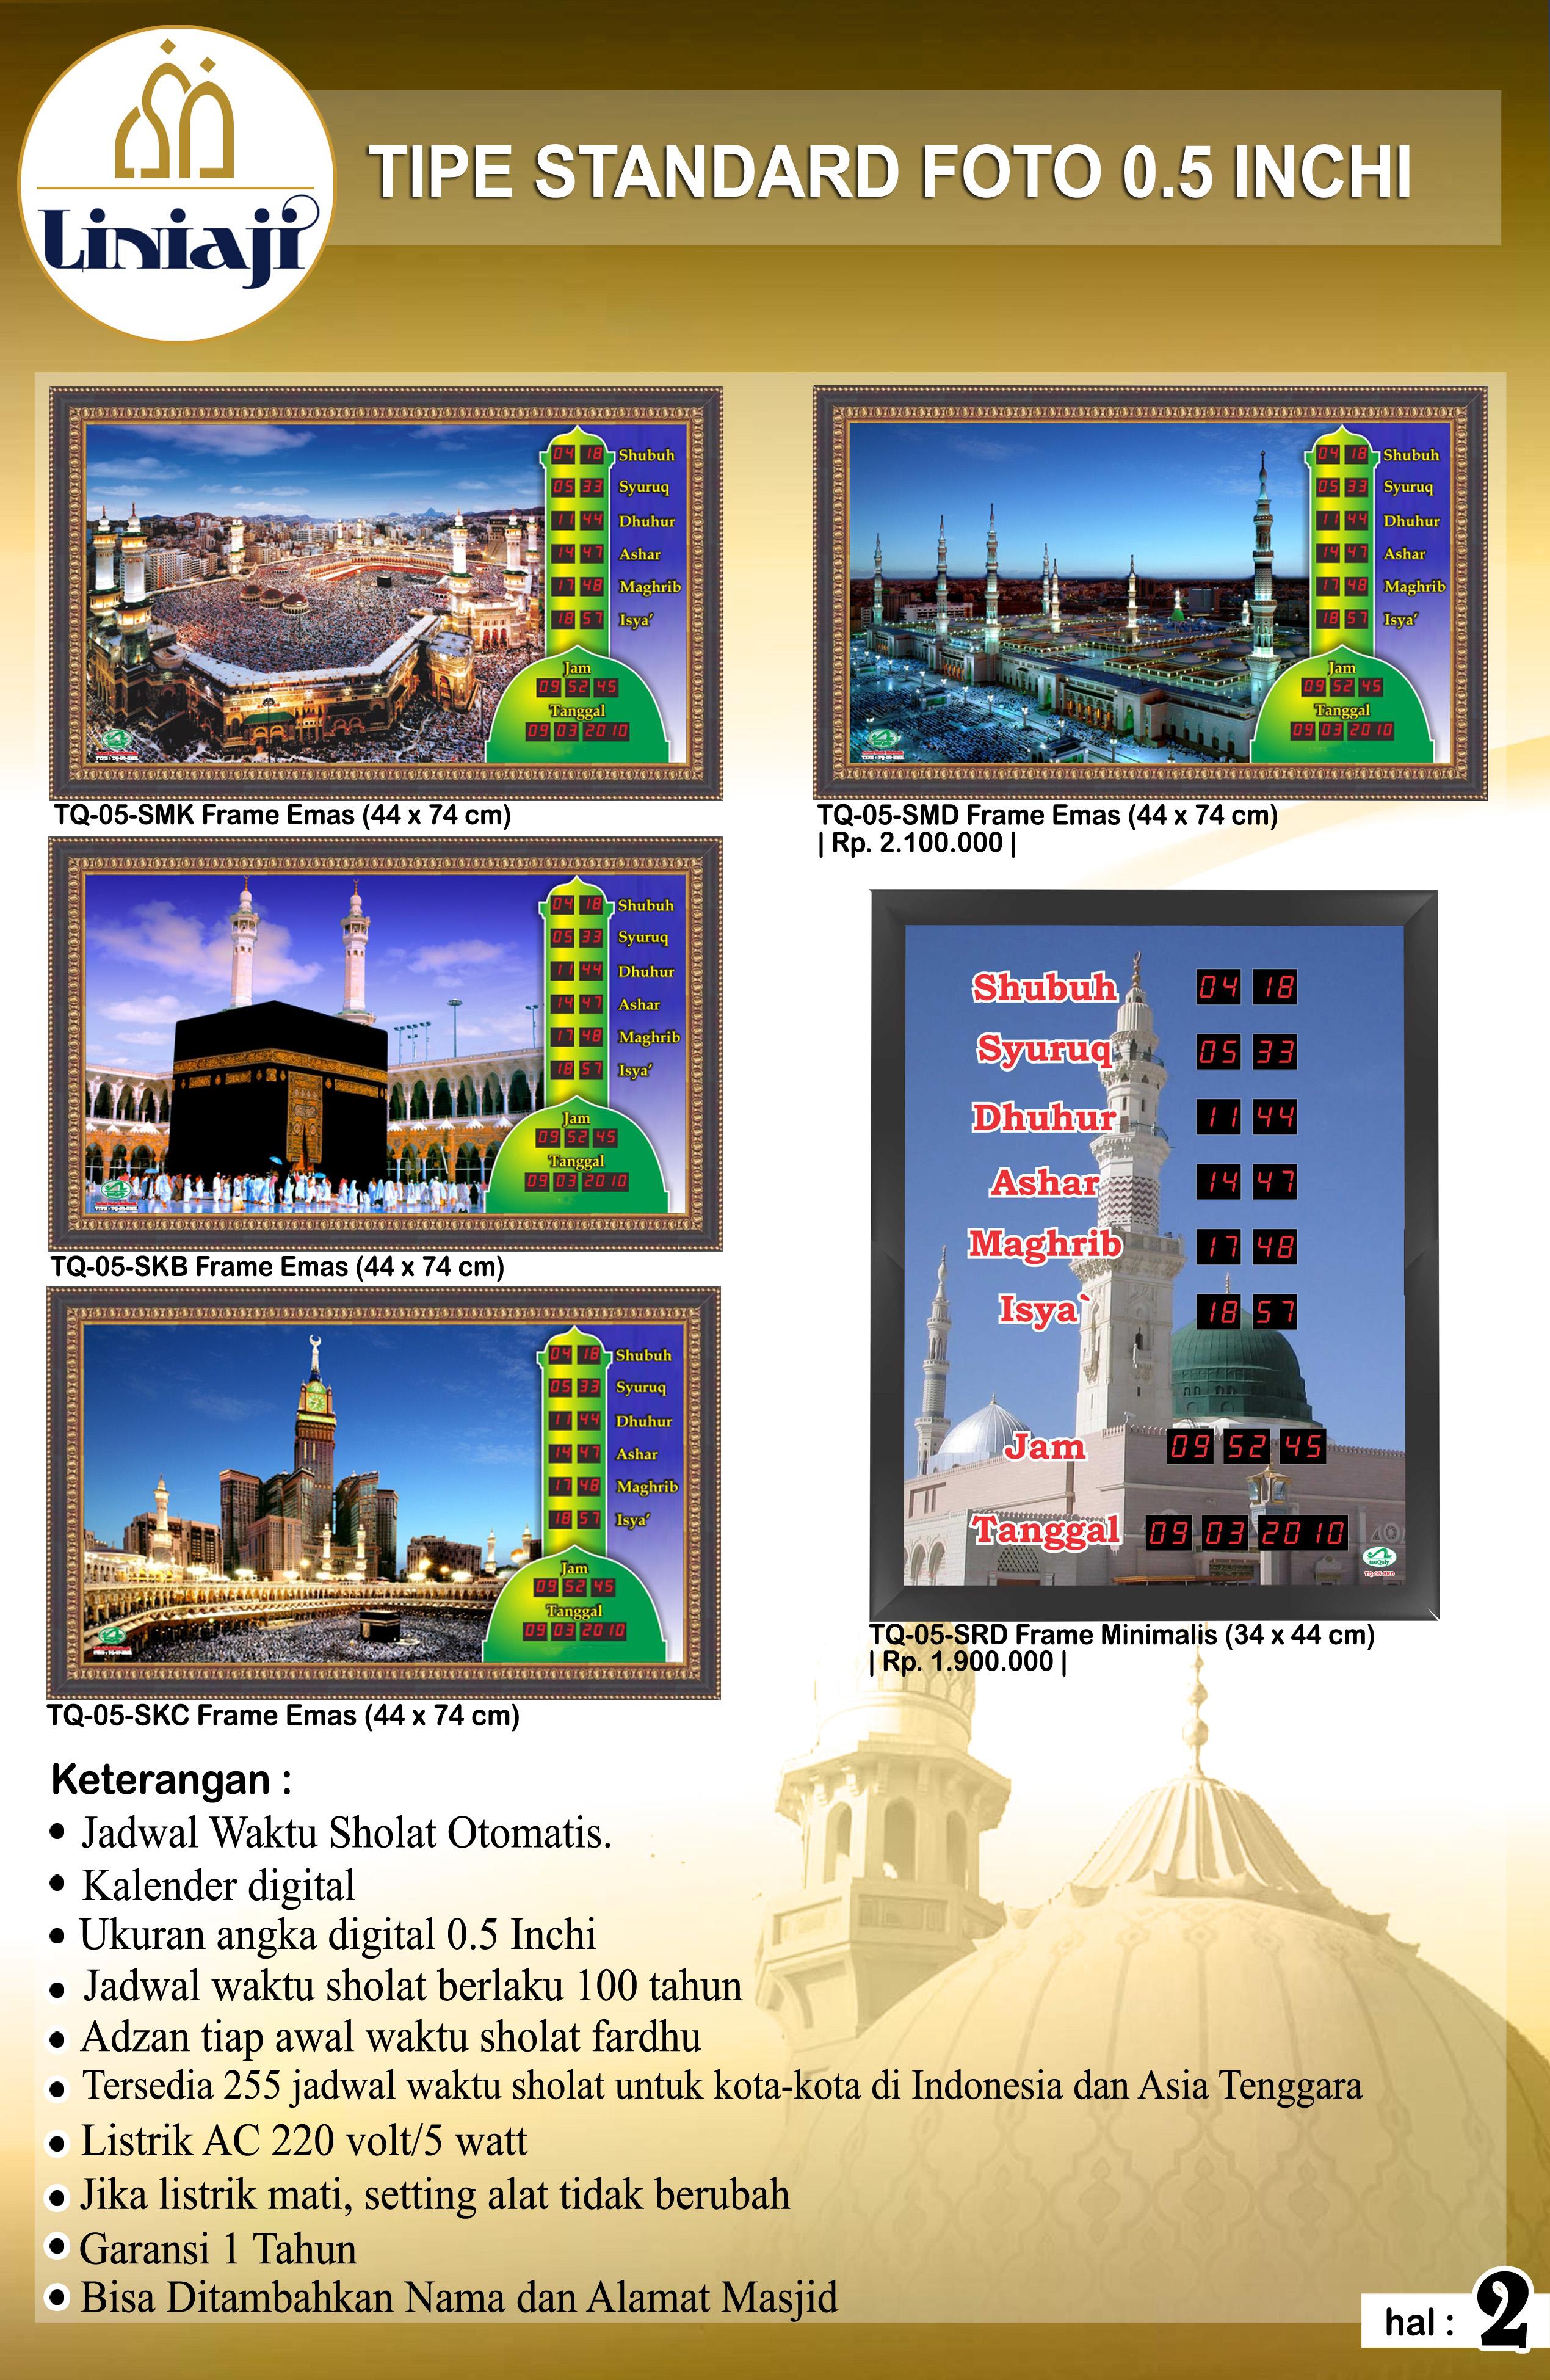 Jual Jam Digital Masjid Di Pekayon Jaya - JAM LINIAJI  0edcdb98fc